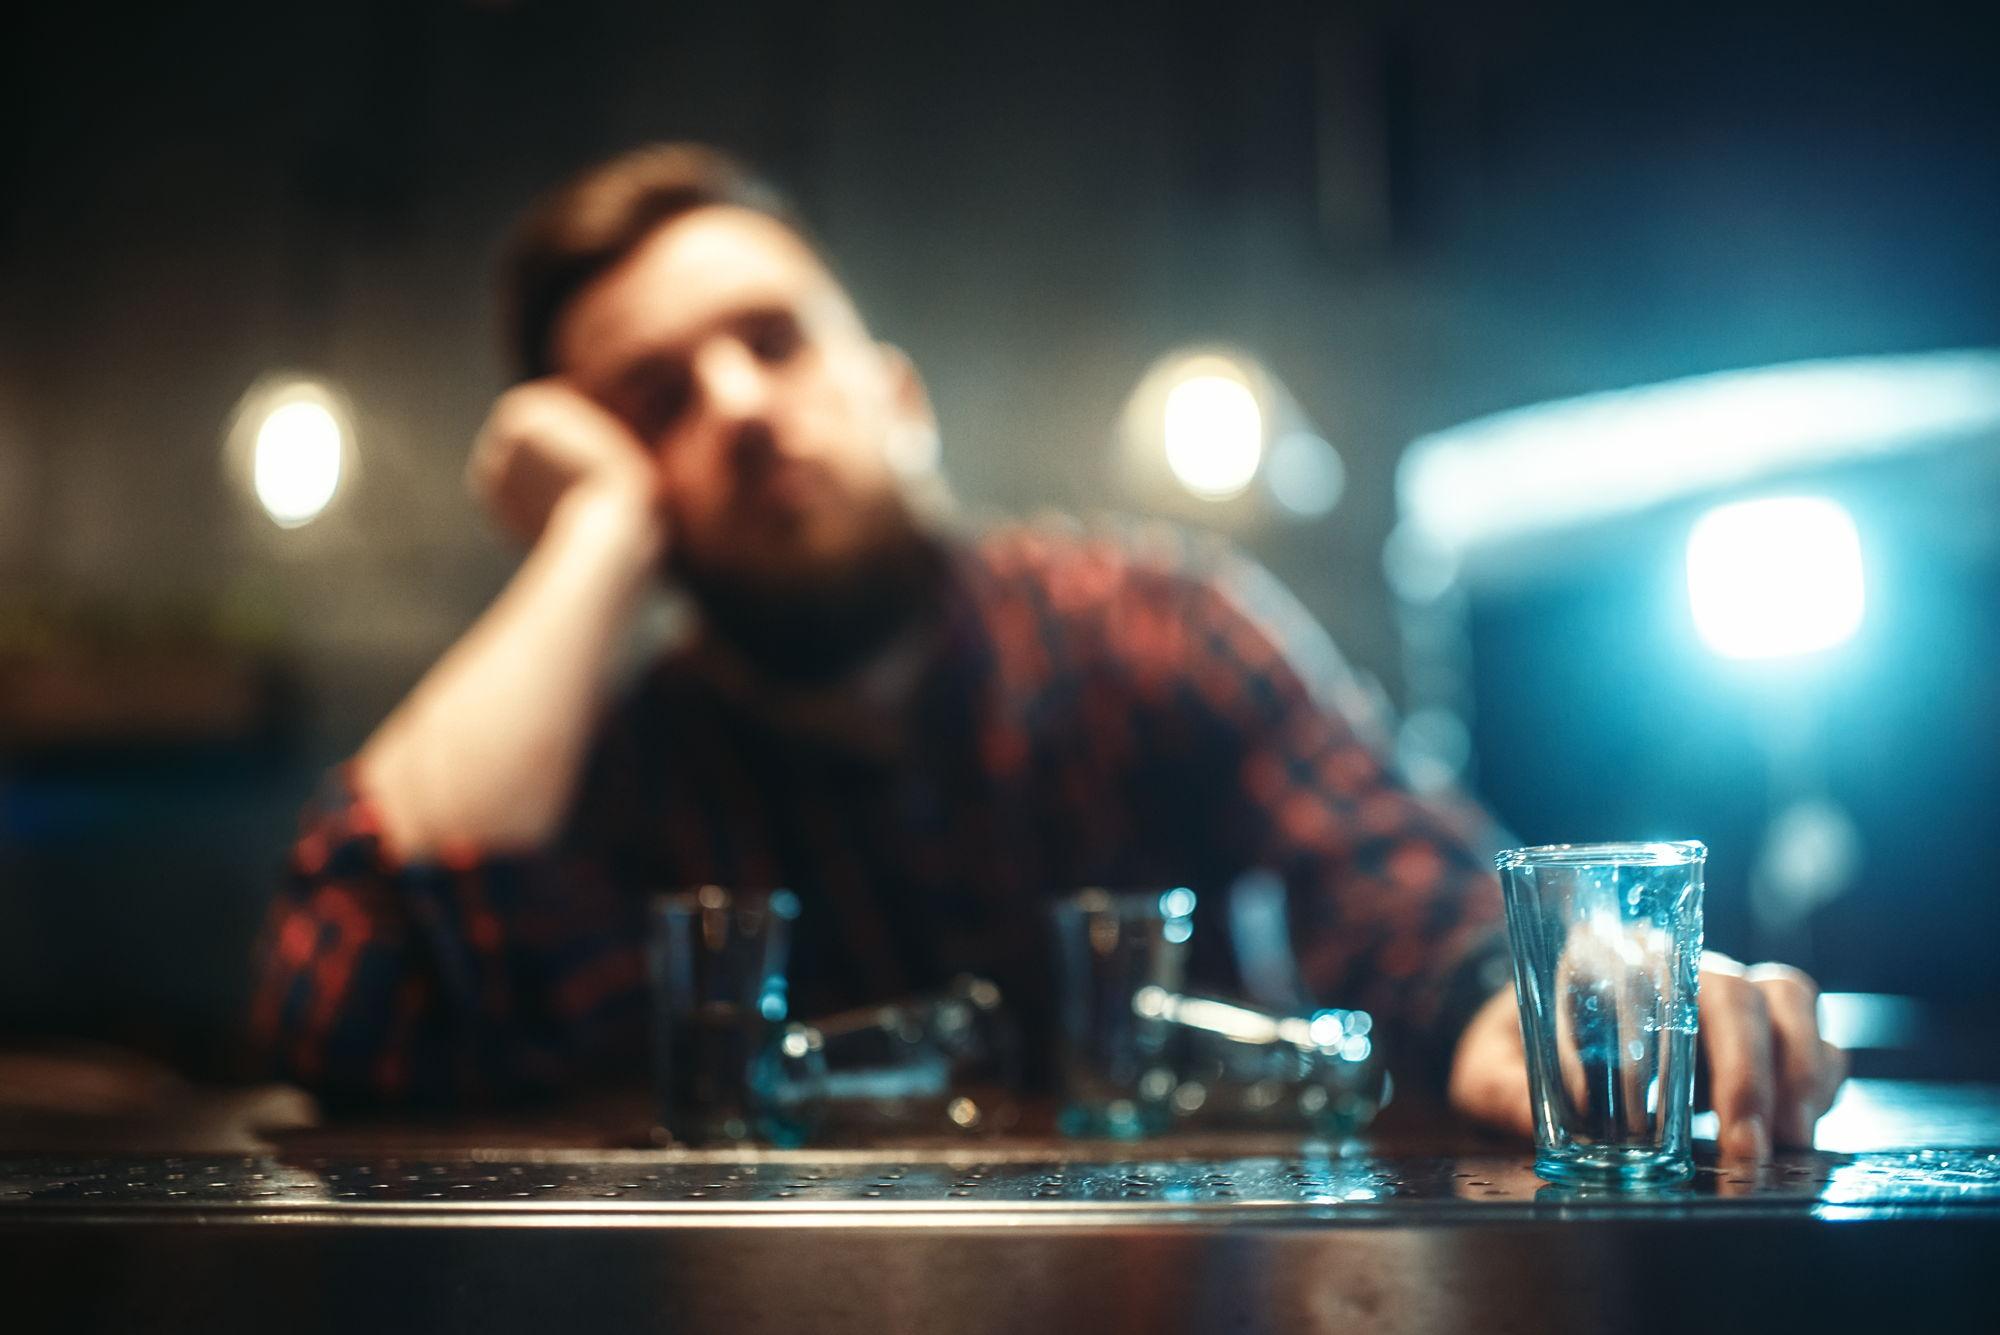 man with blurred vision drunk at bar